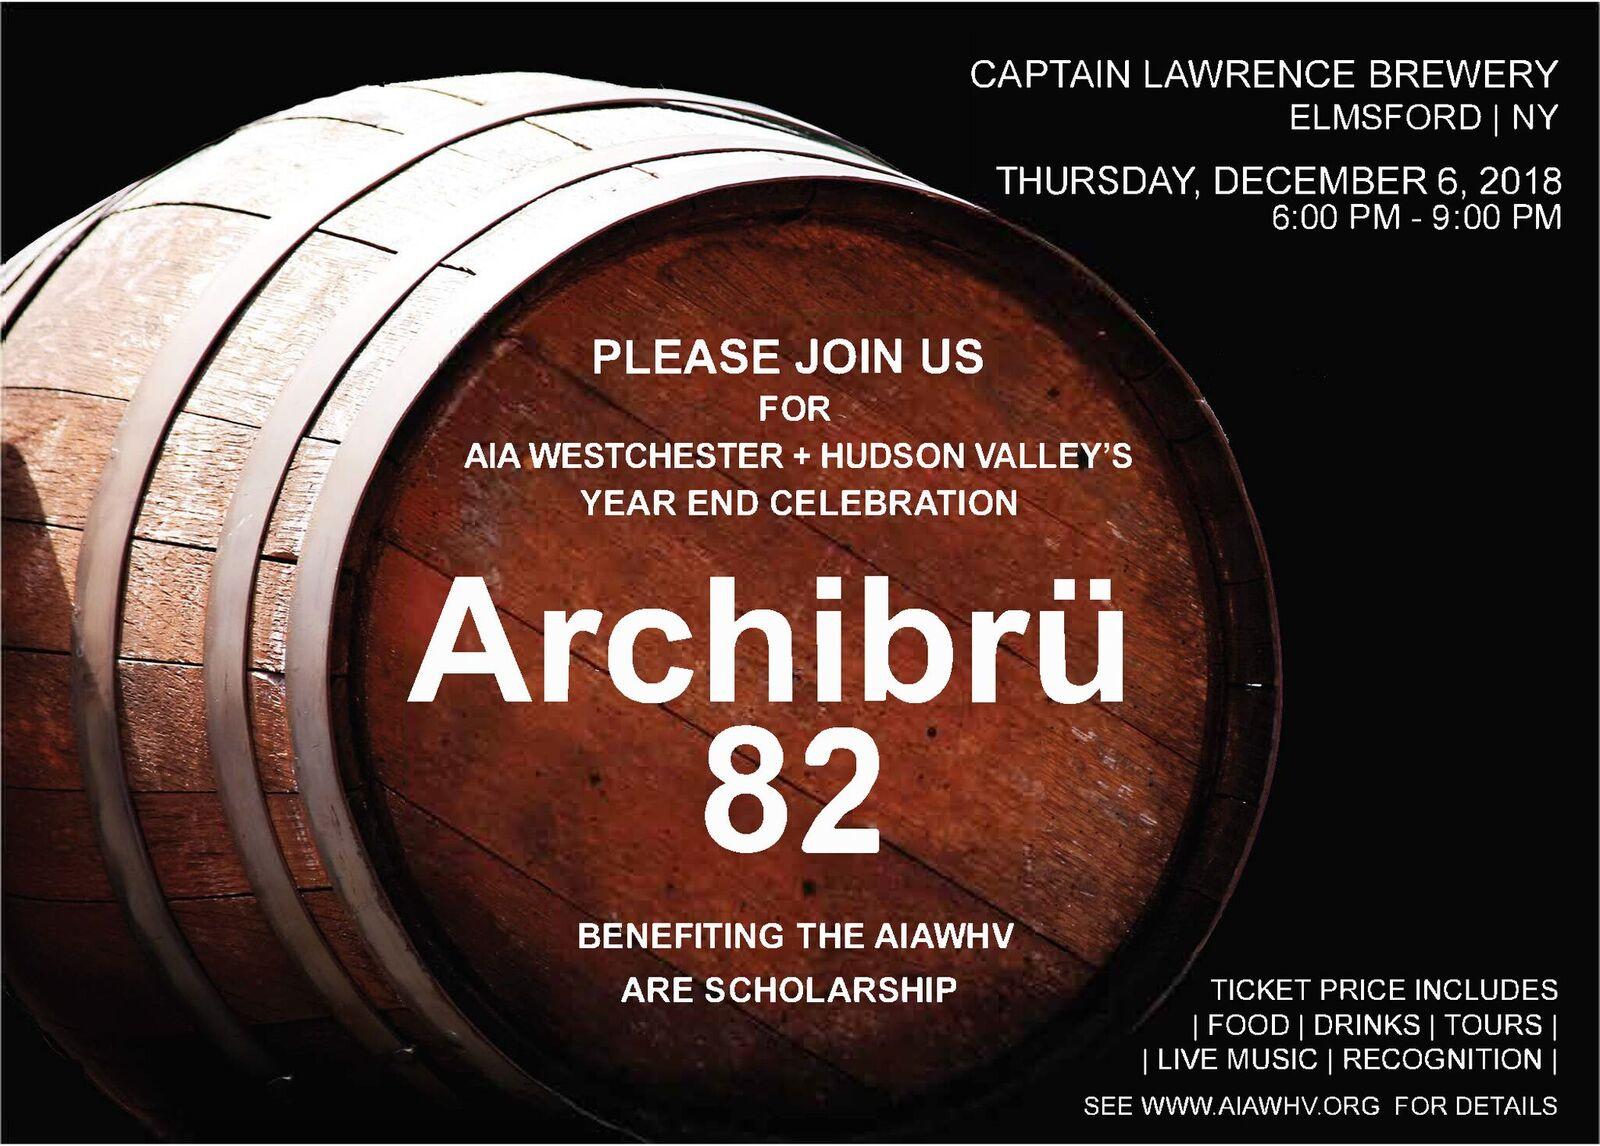 Archibru 82.png